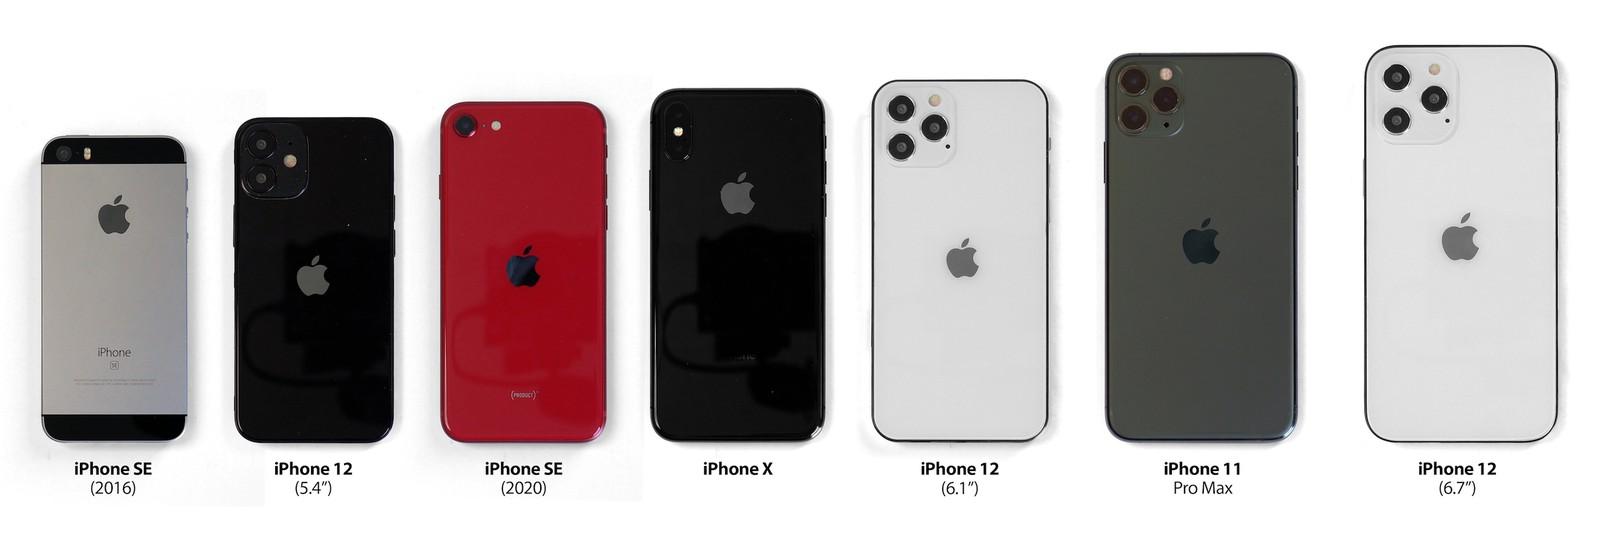 iPhone 12 Size Estimates